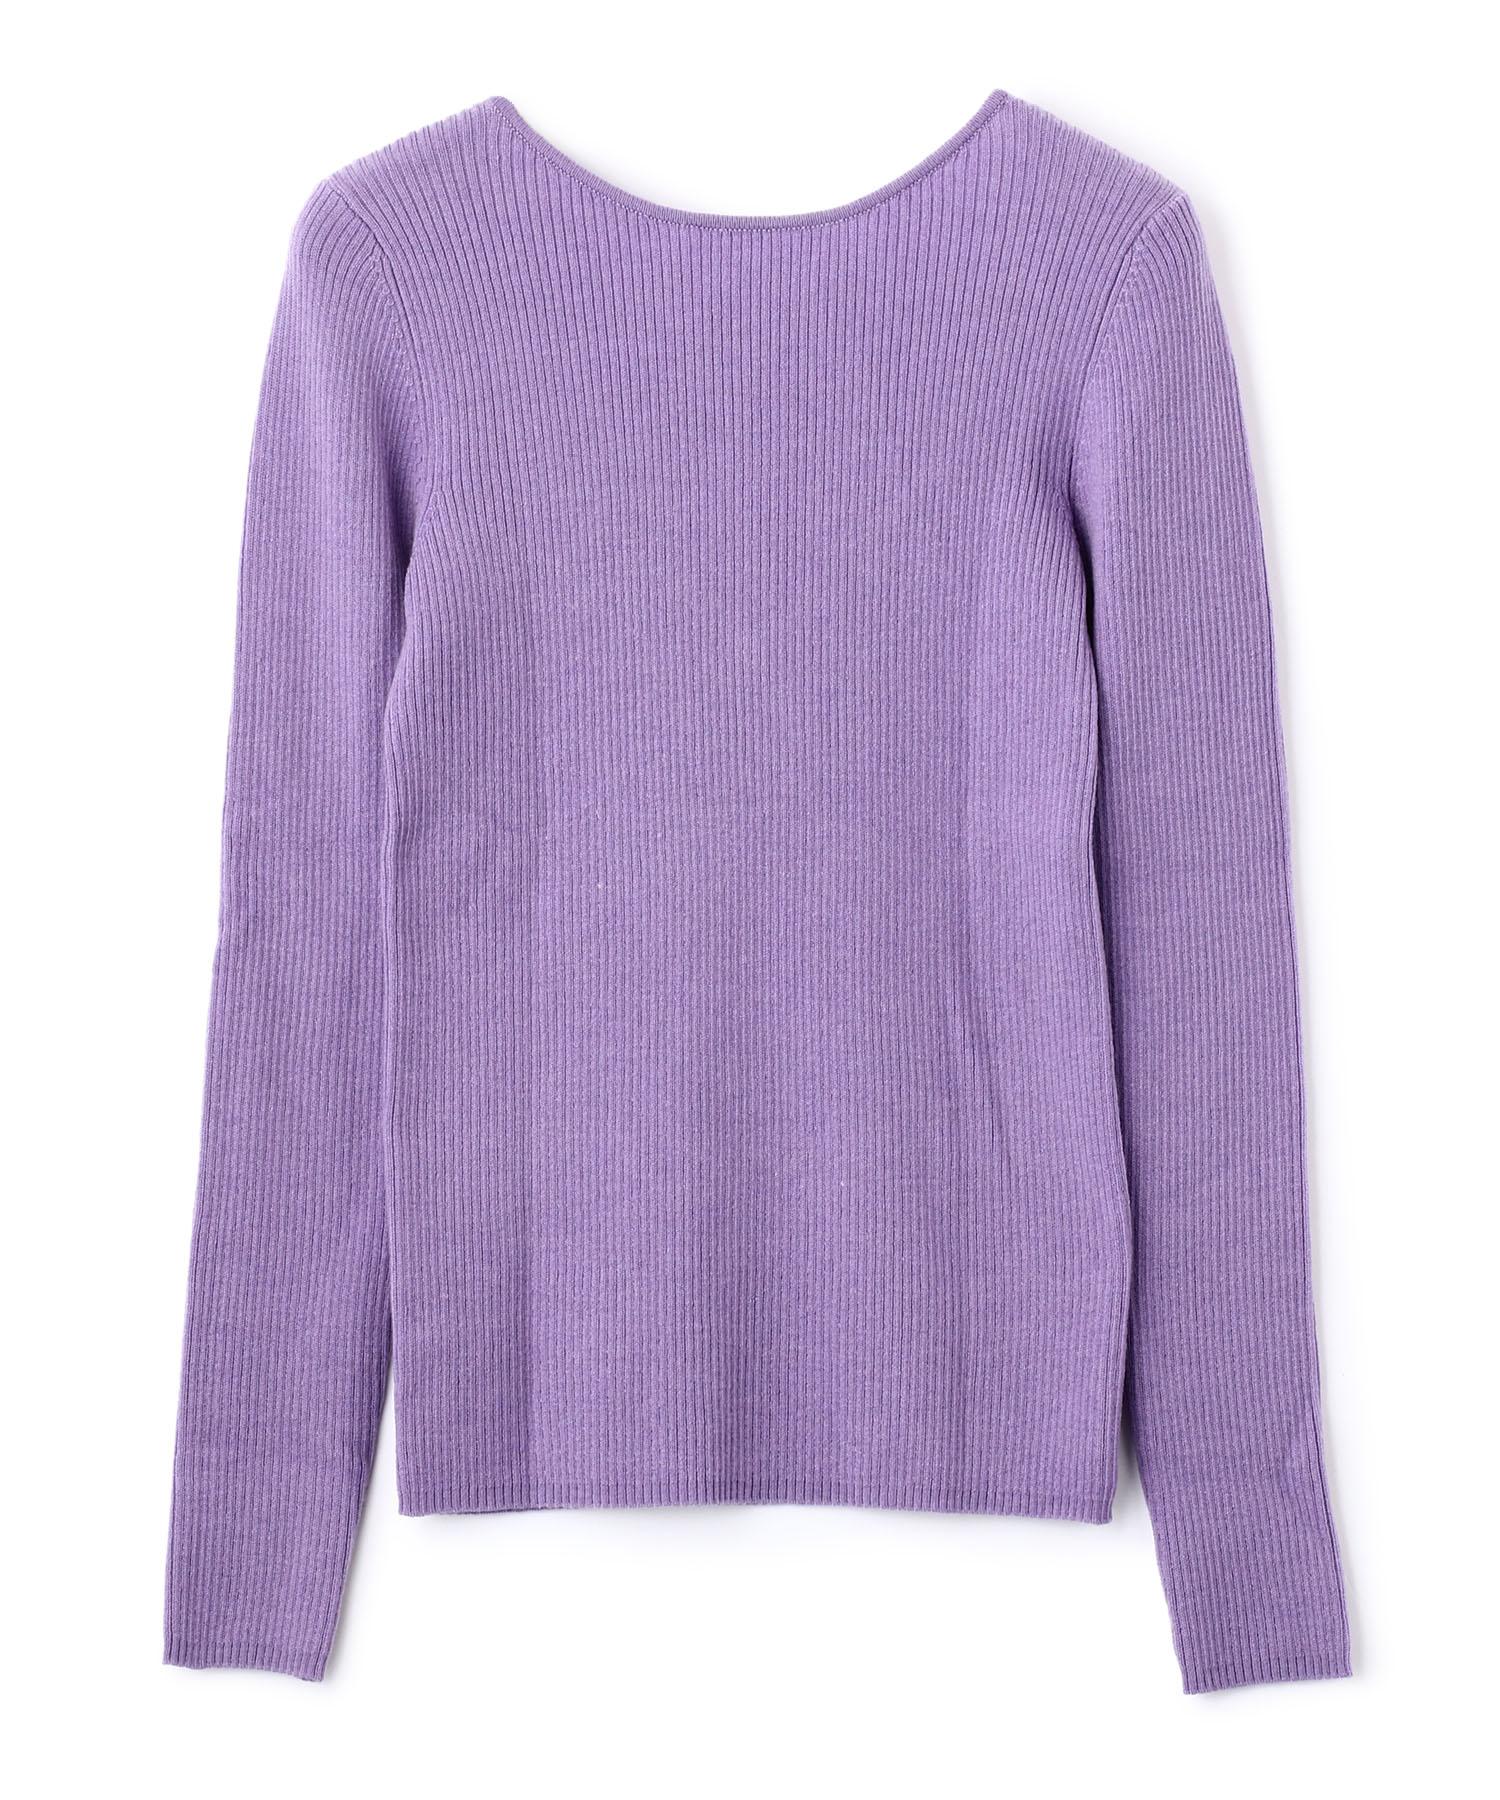 Back Lace Lib Knit Pullover